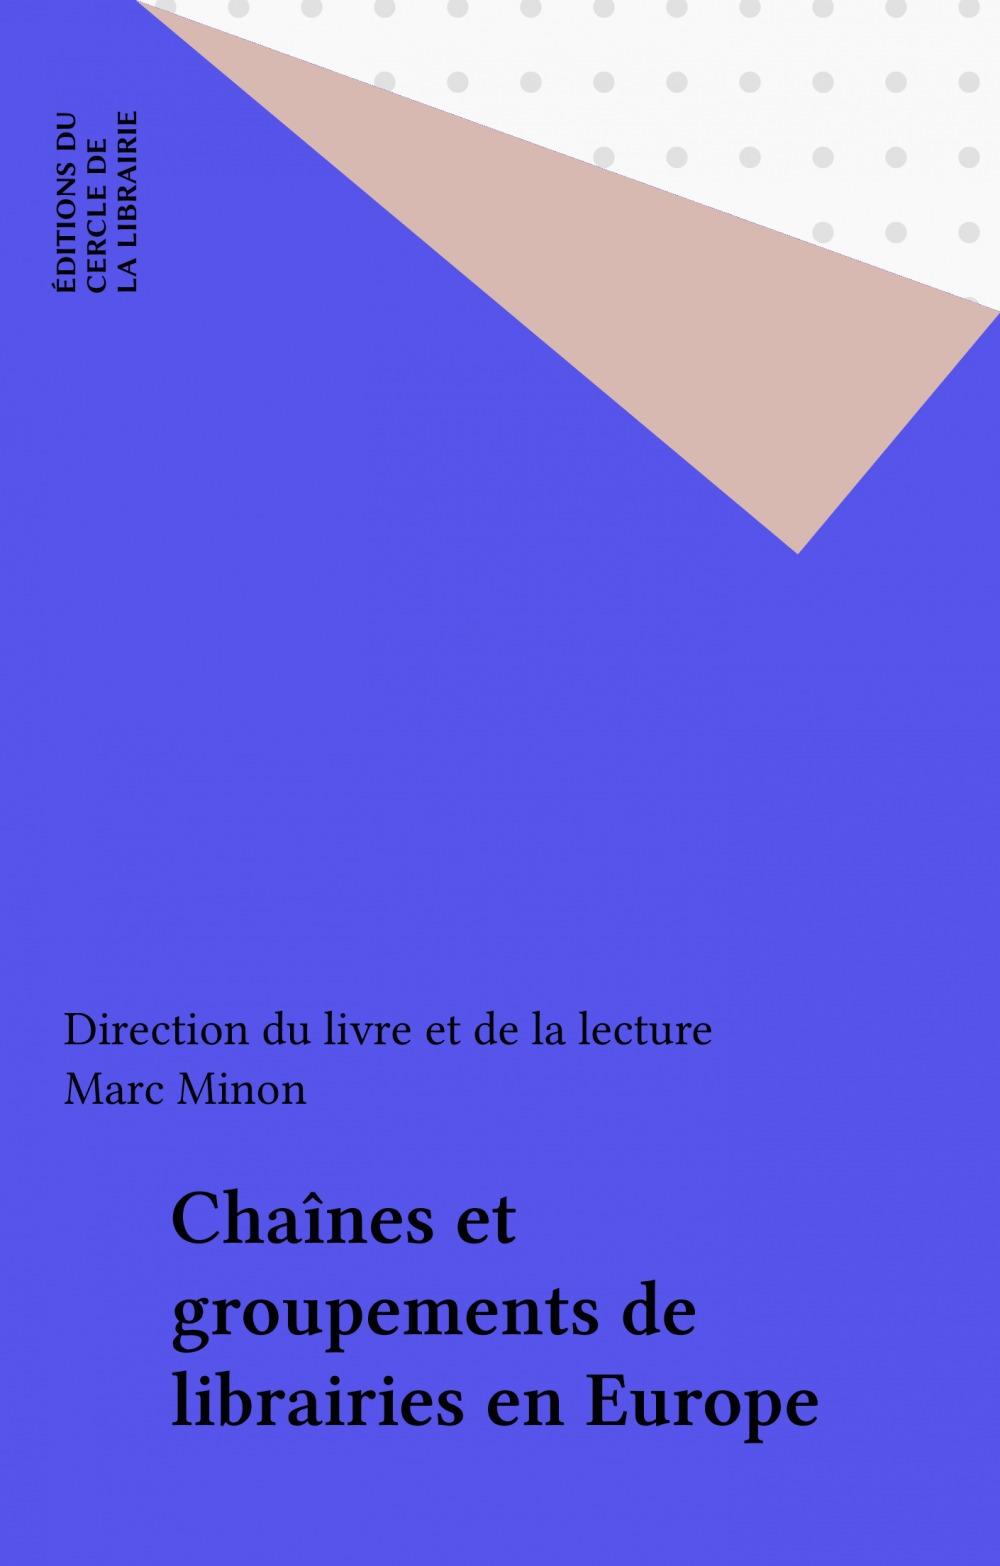 Chaines group.librairies